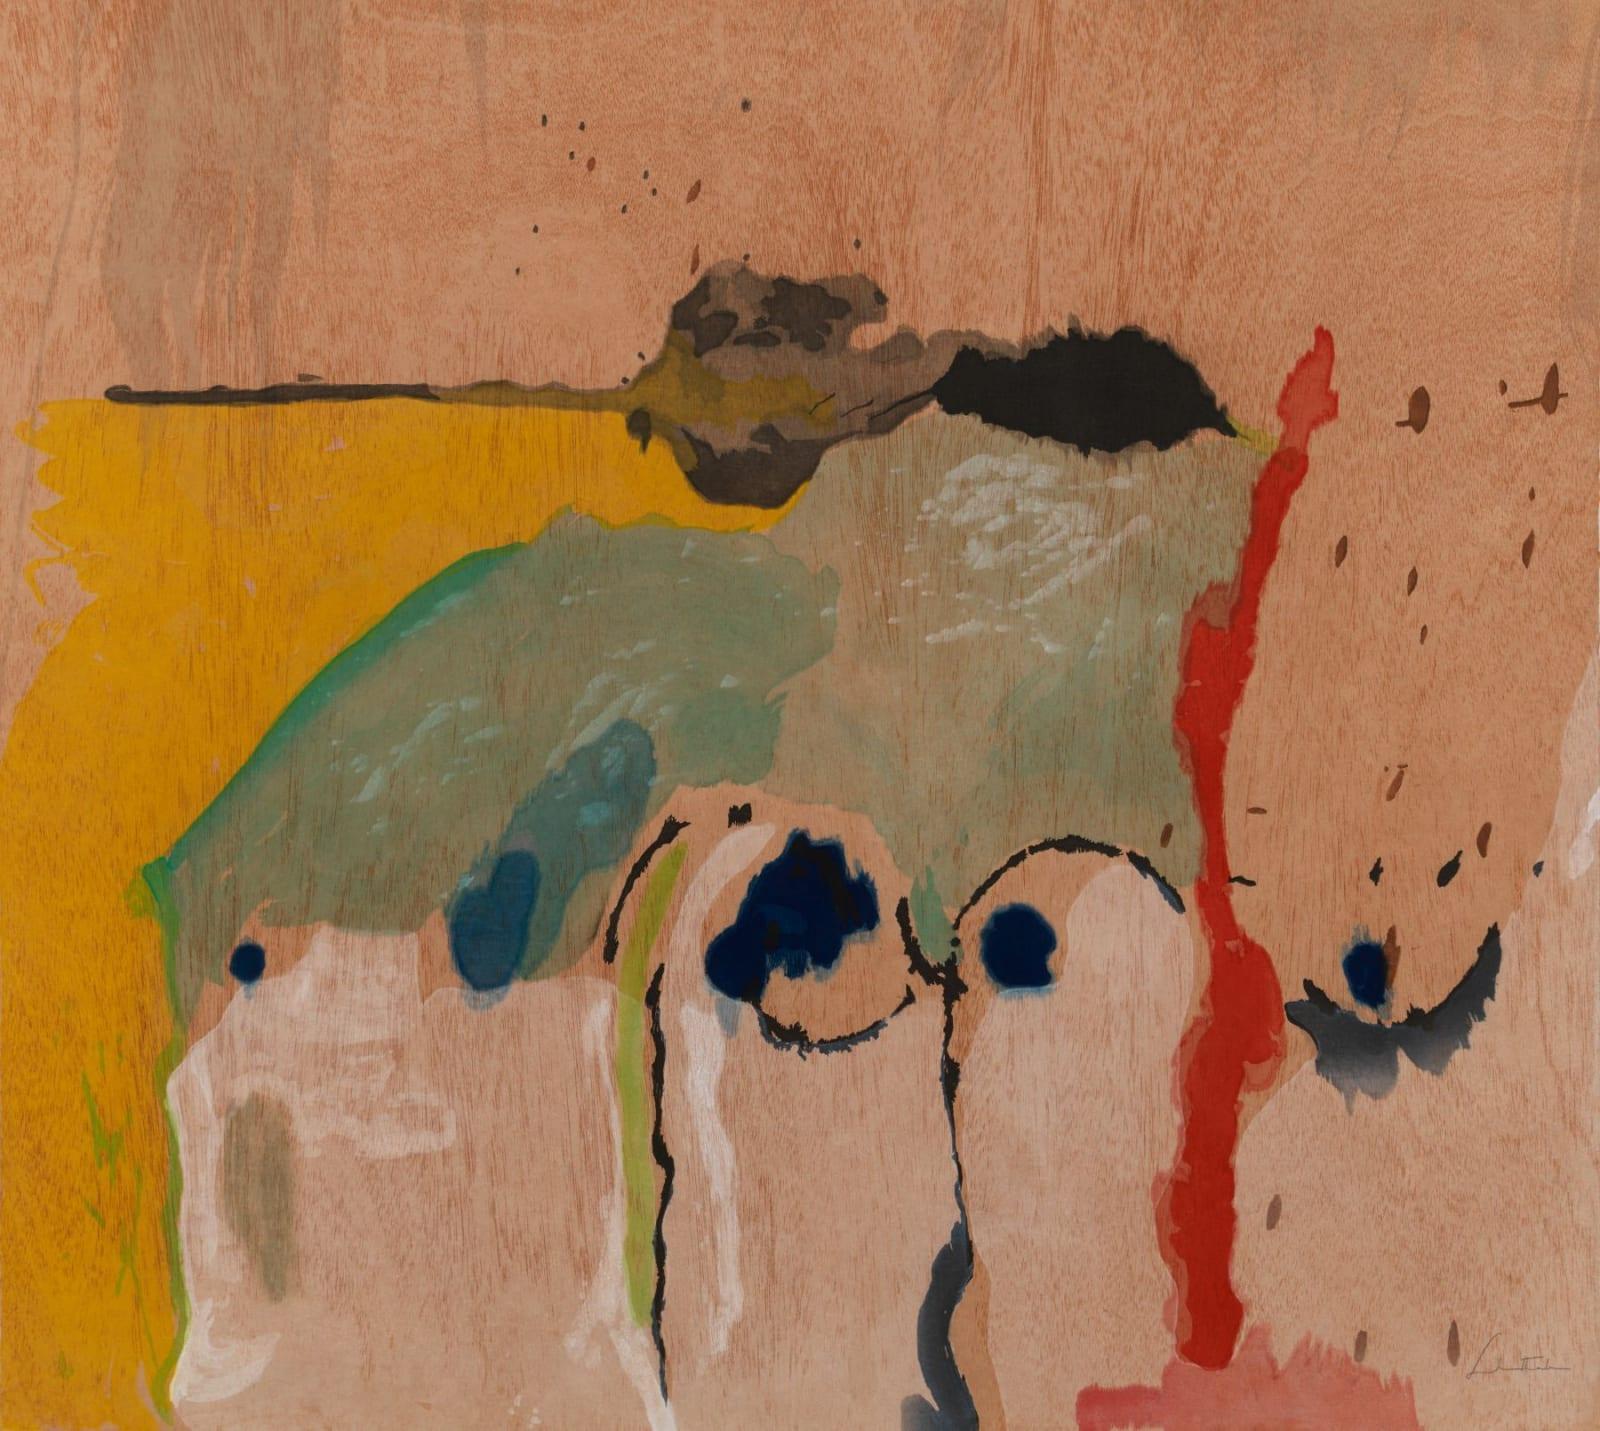 Helen Frankenthaler, Tales of Genji I, 1998